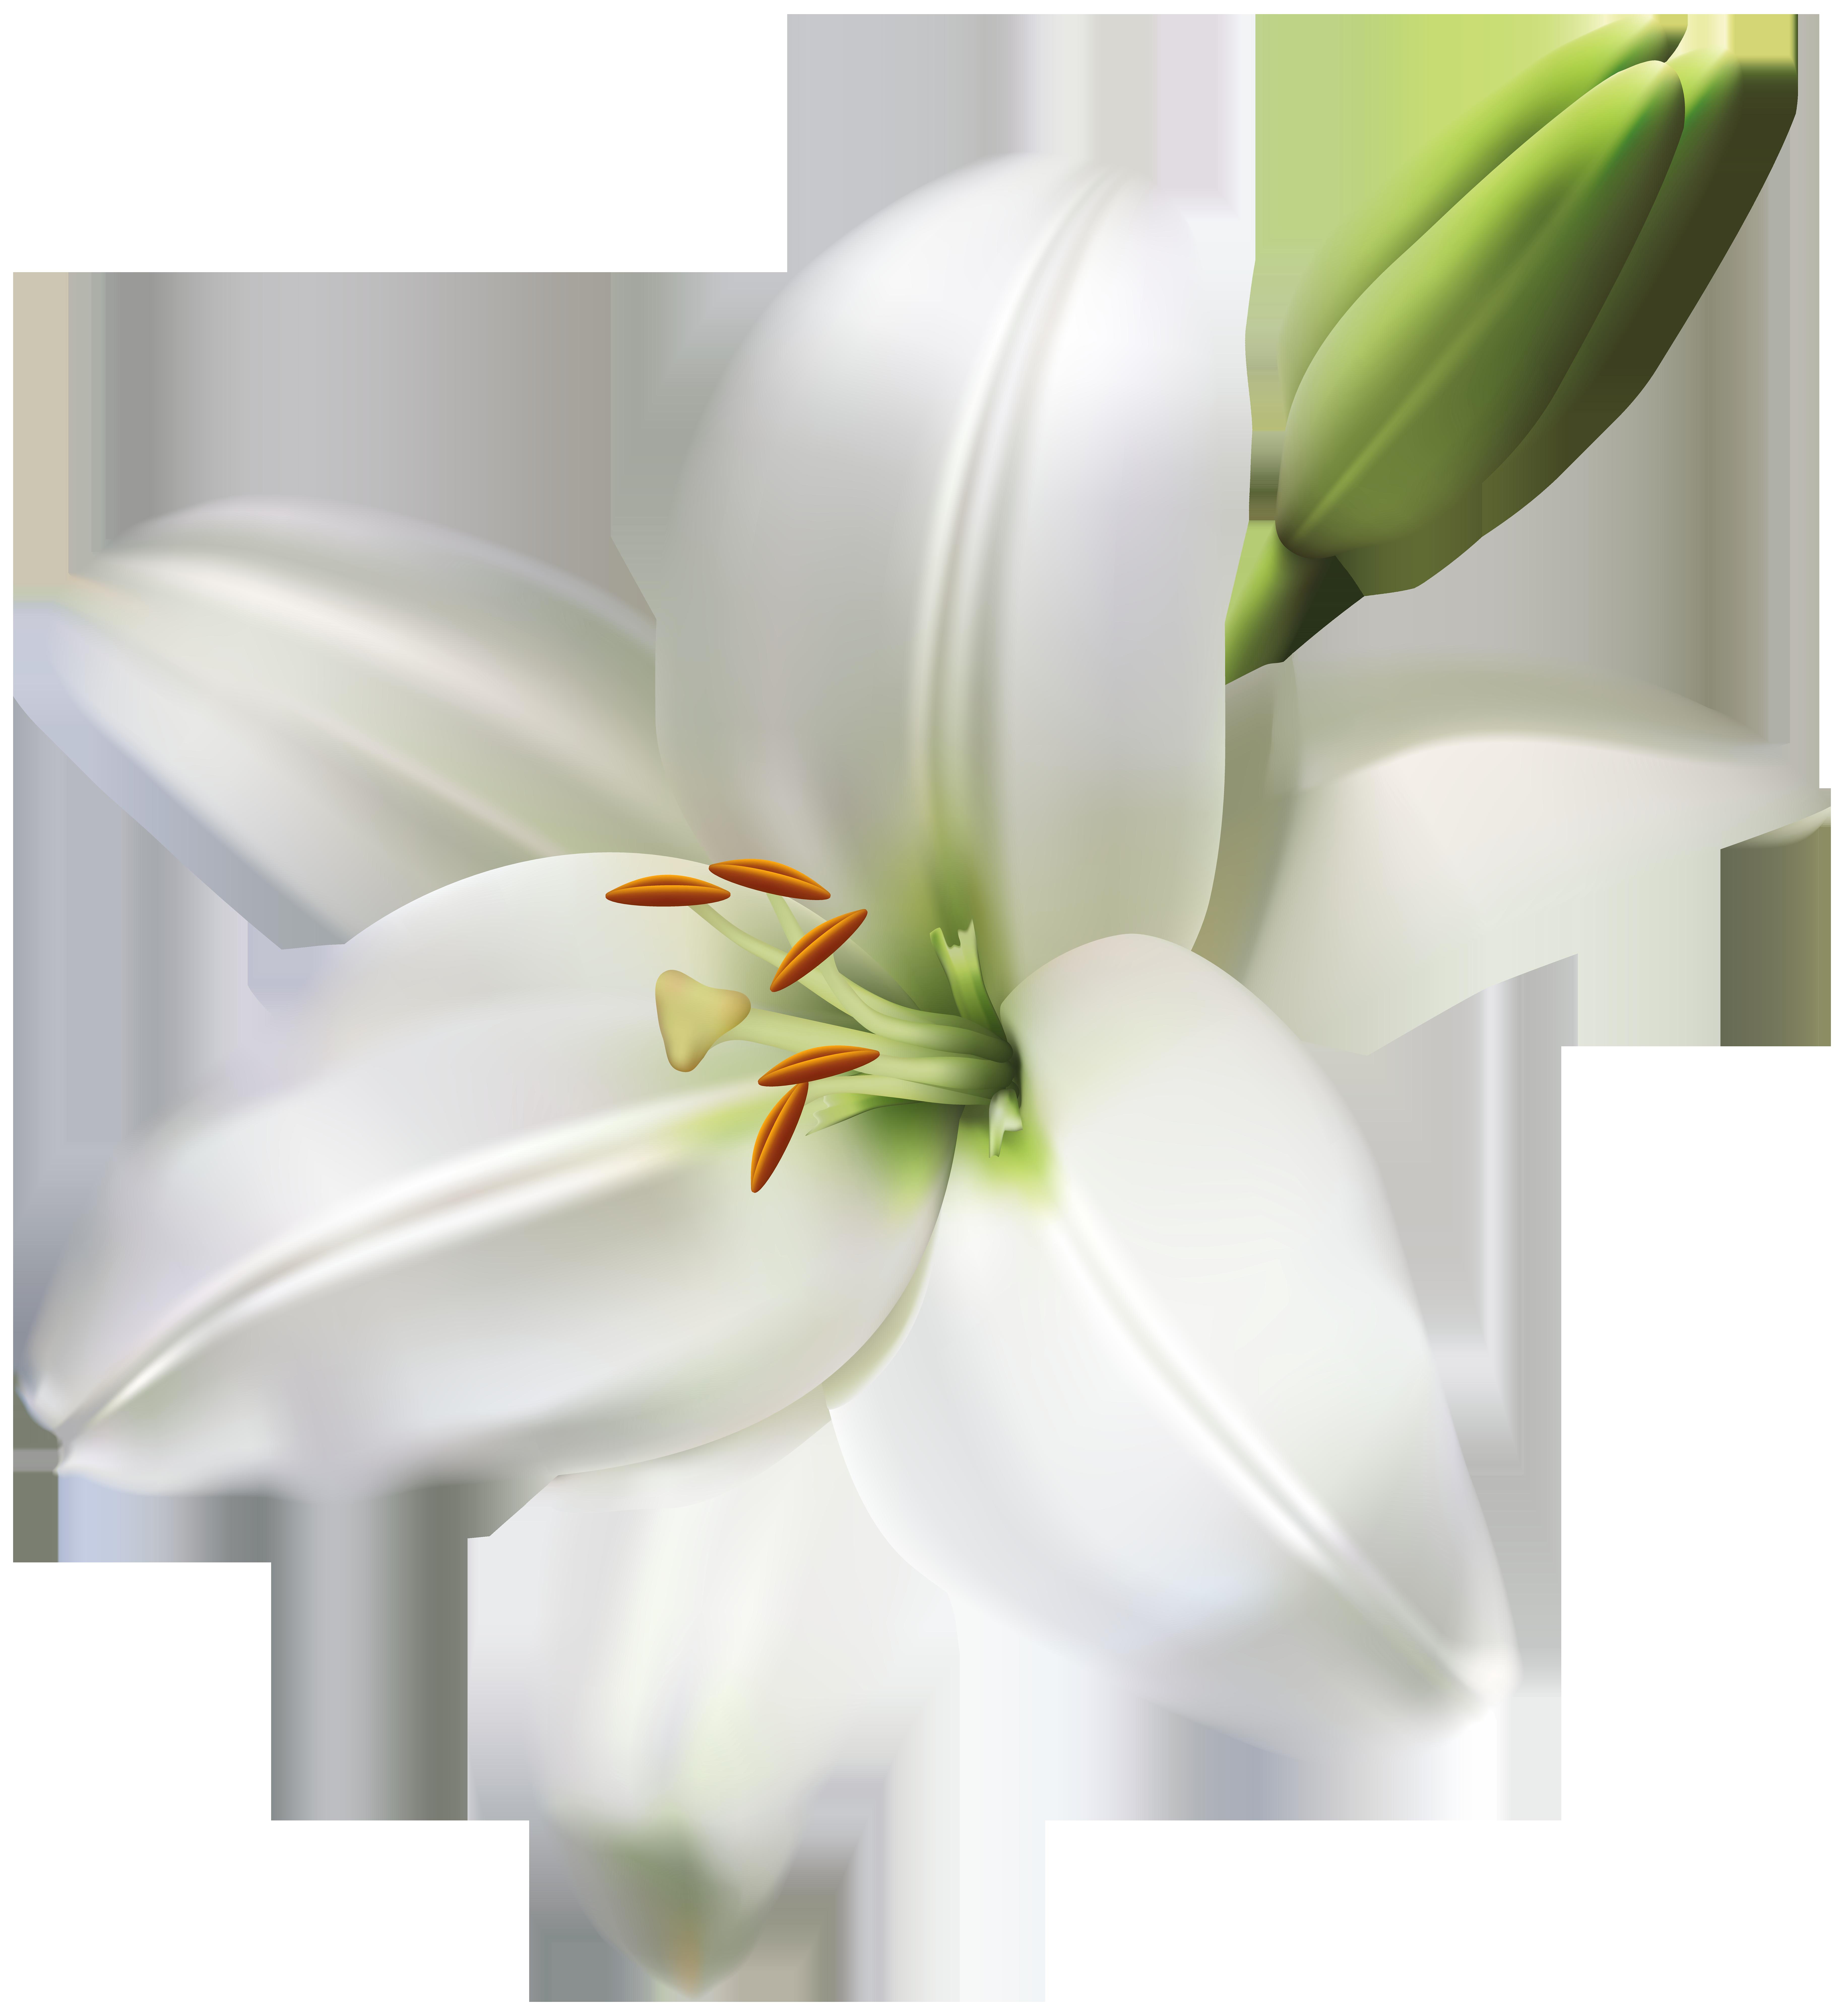 Lily Flower Transparent PNG Clip Art Image.